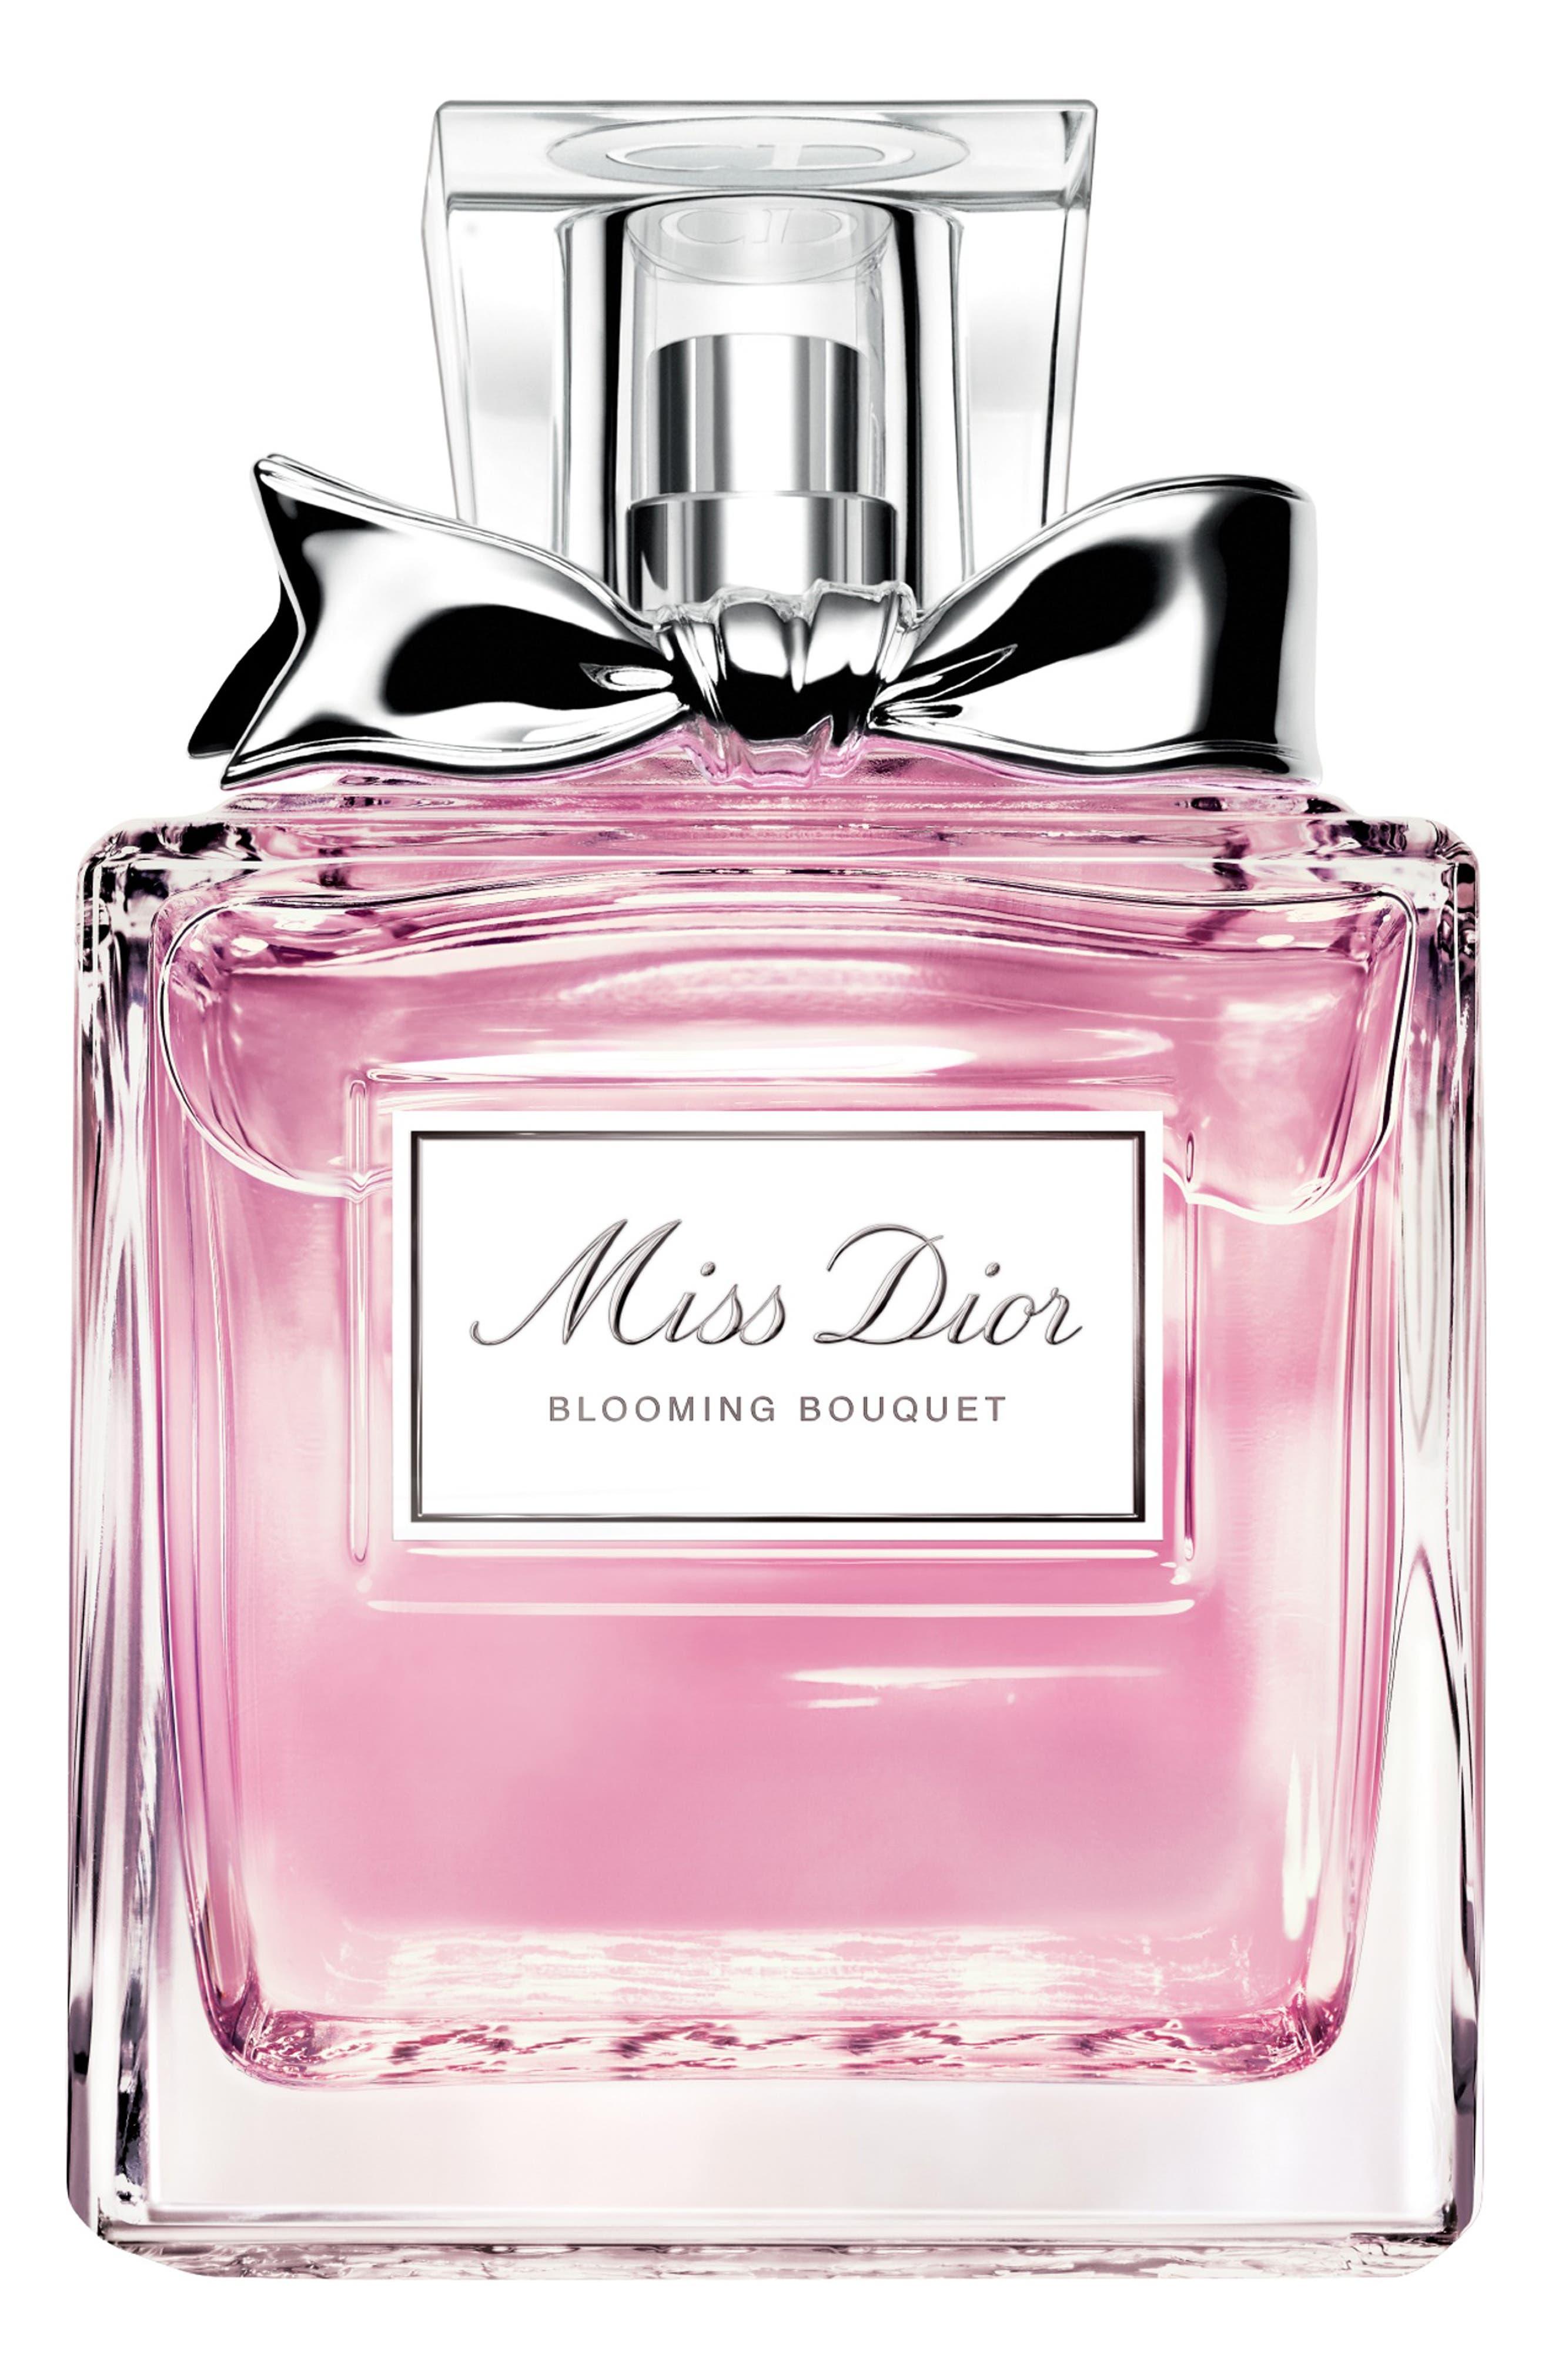 c9c37600127afc Miss Dior   Miss Dior Perfume